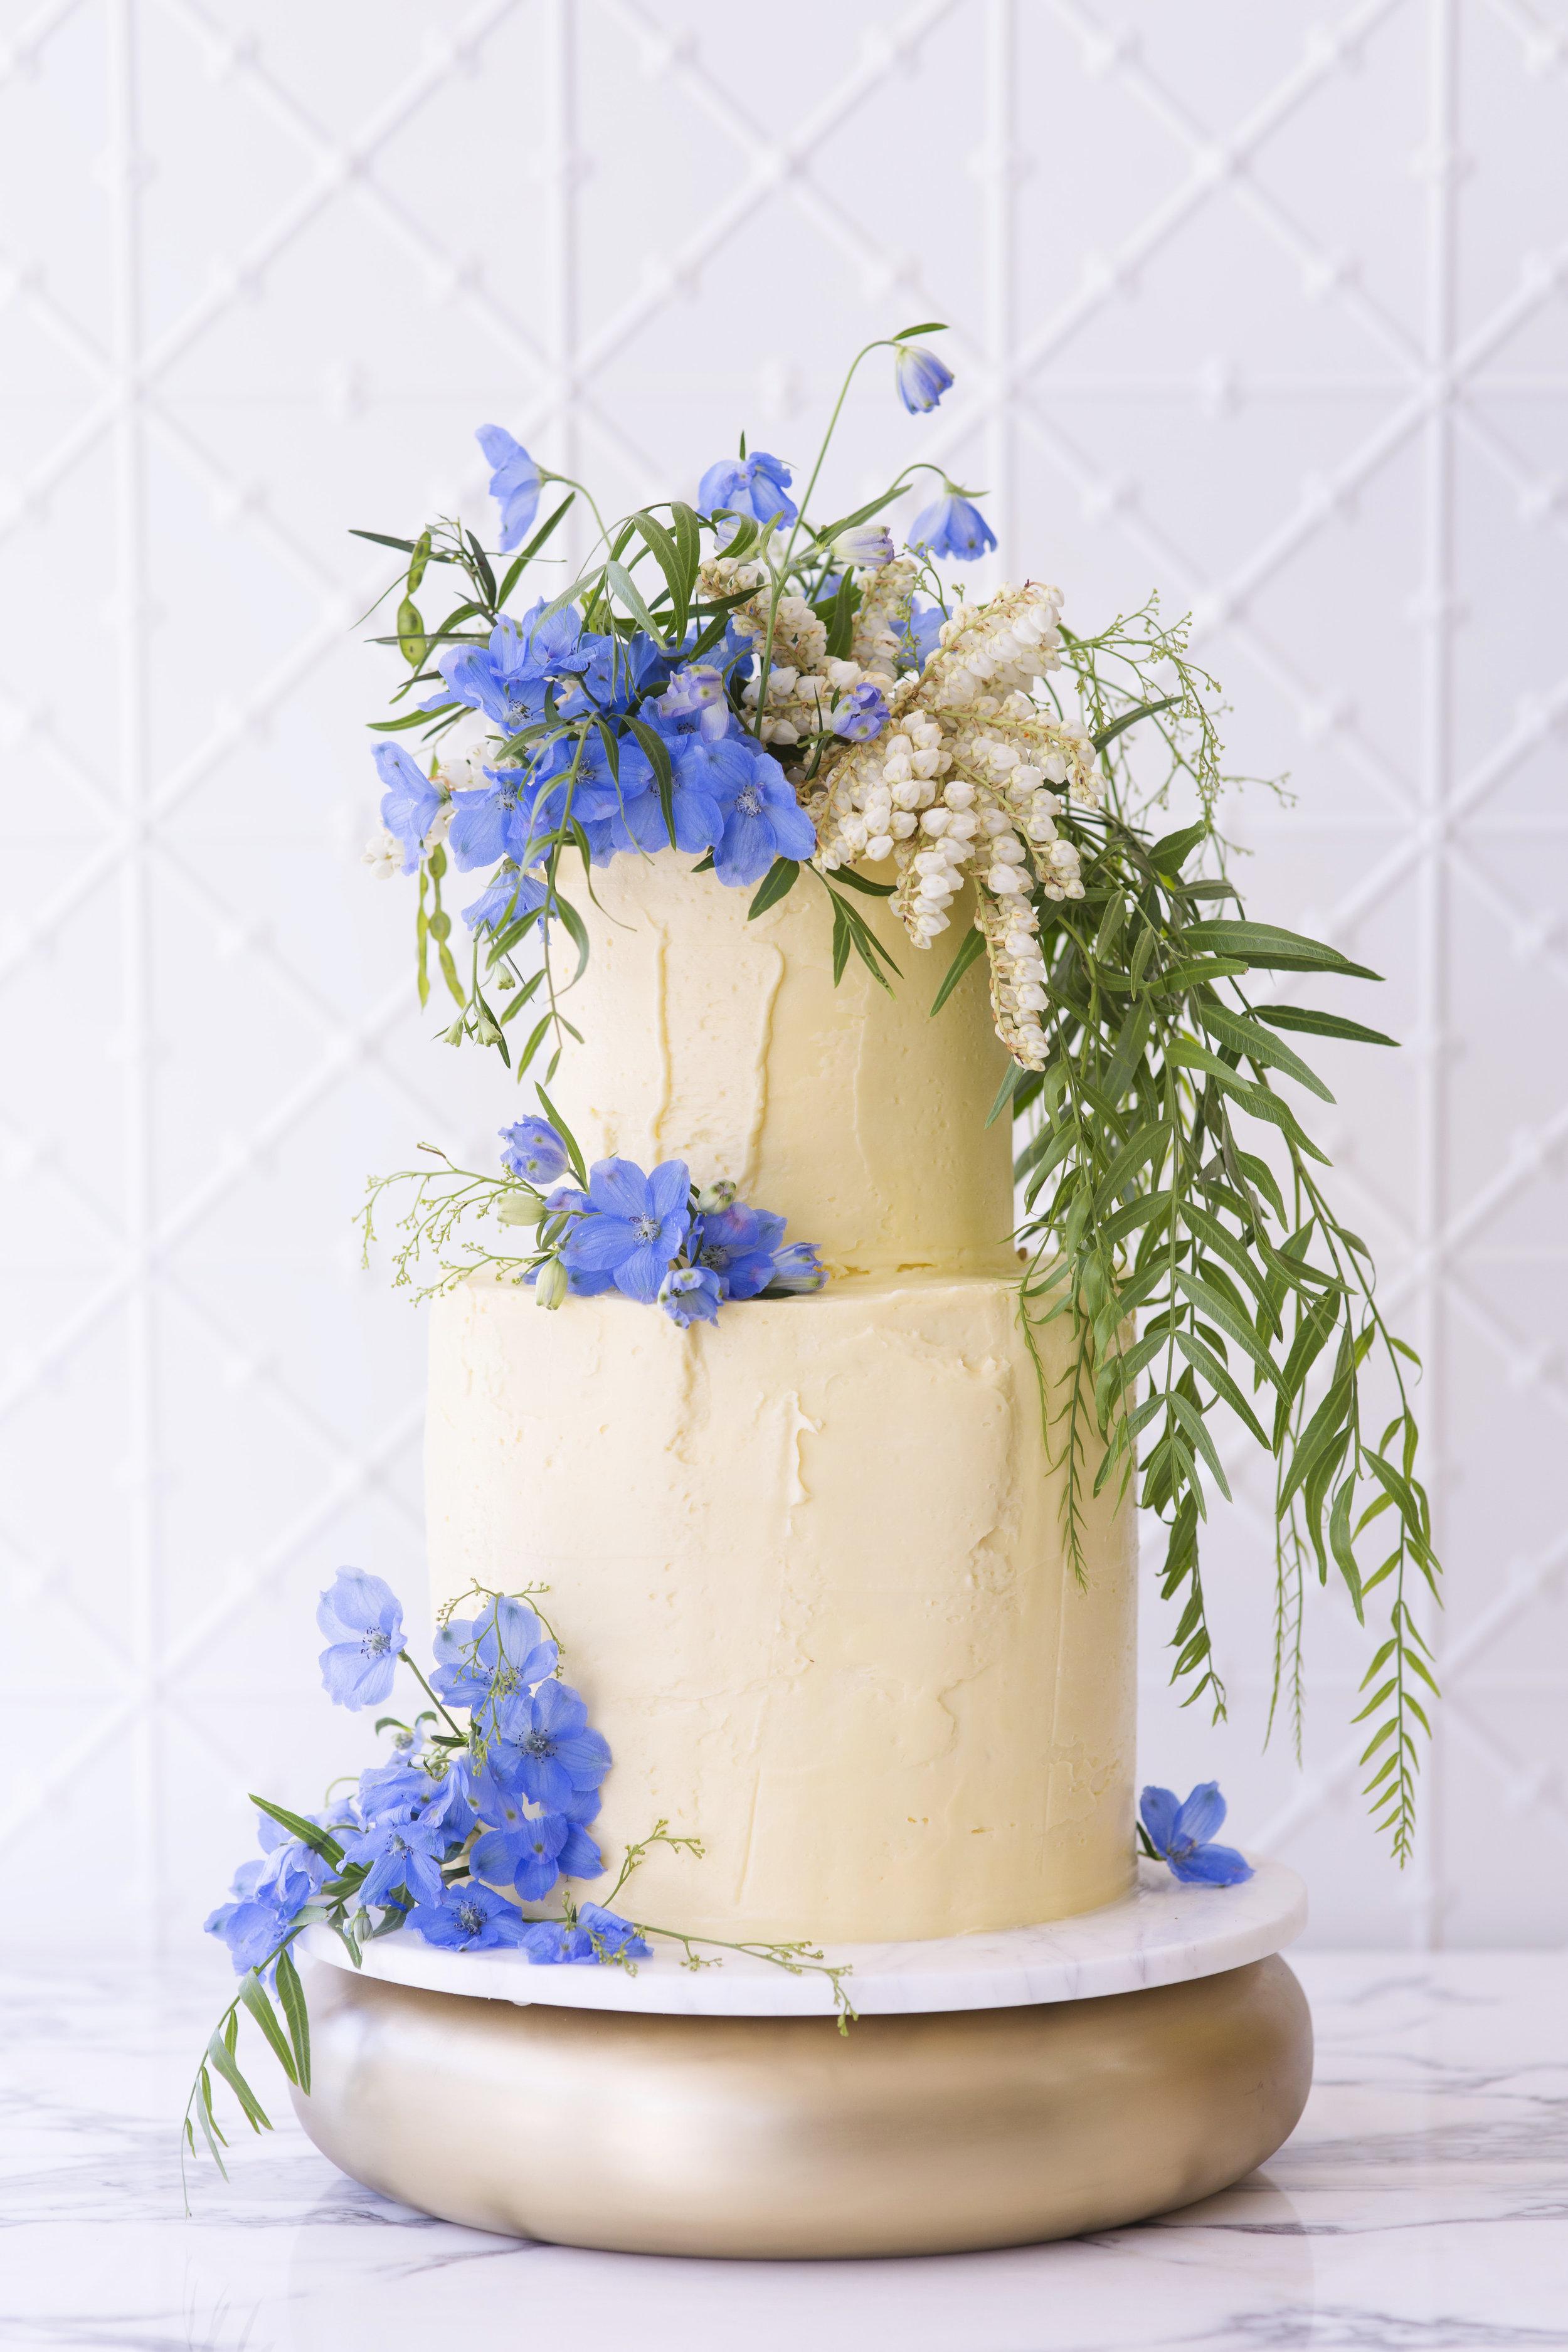 BLOODWOOD BOTANICA X Faye Cahill | Something blue wedding cake